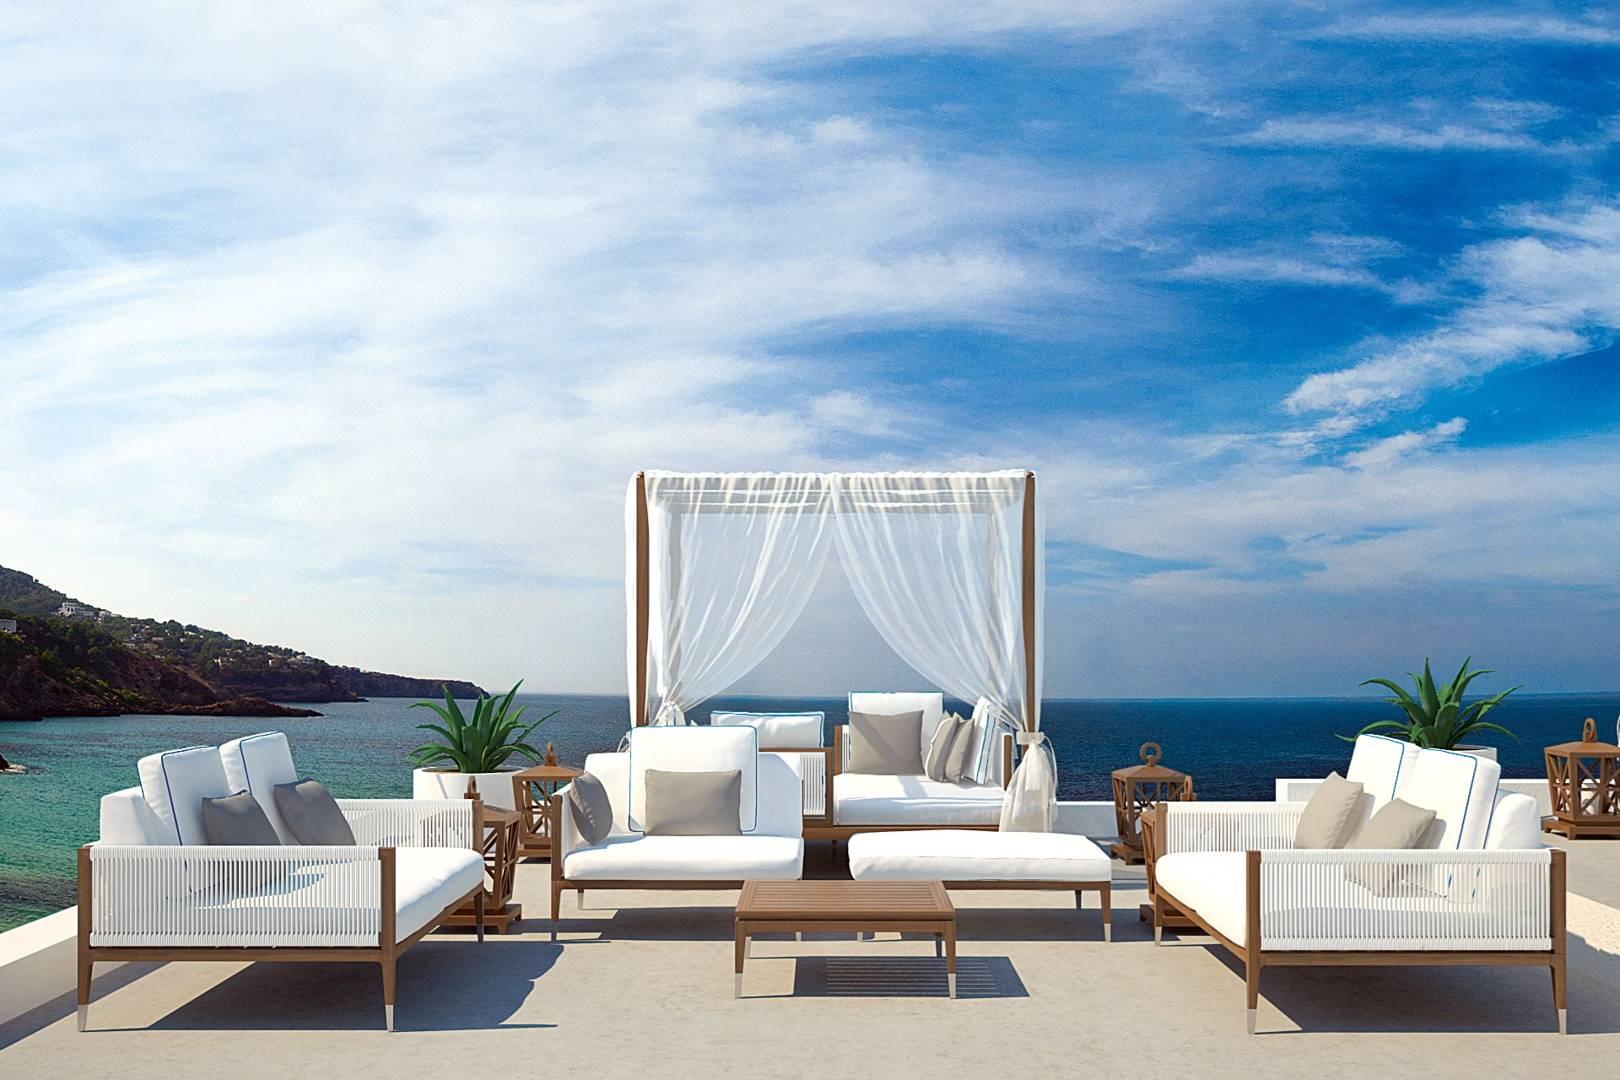 The Best Hotels Restaurants Villas And Beach Clubs In Ibiza Cn Traveller